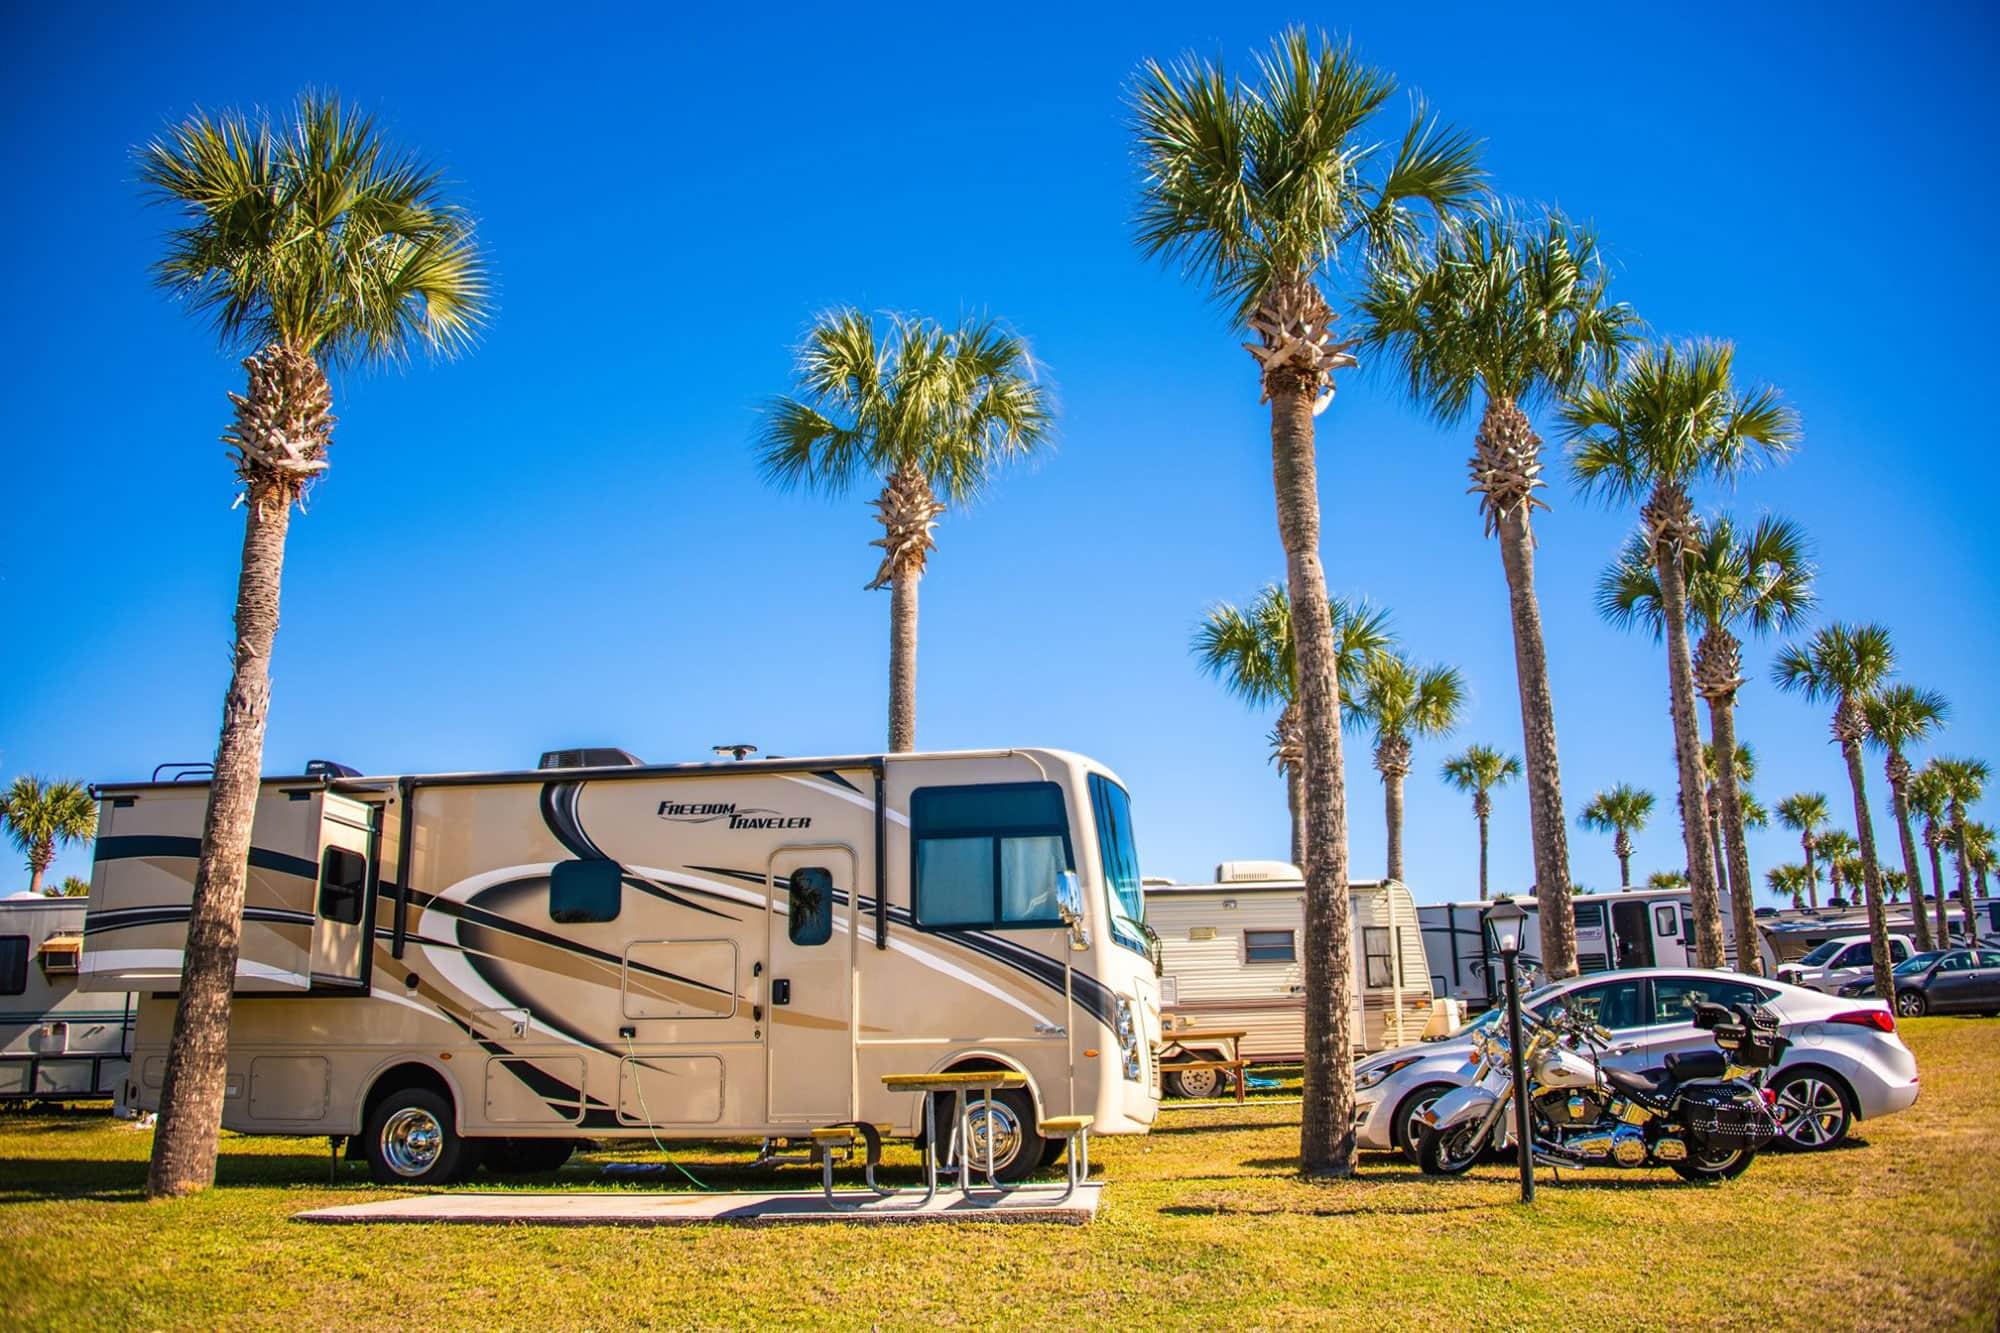 Motorhomes parked at Orlando Southwest KOA in Davenport